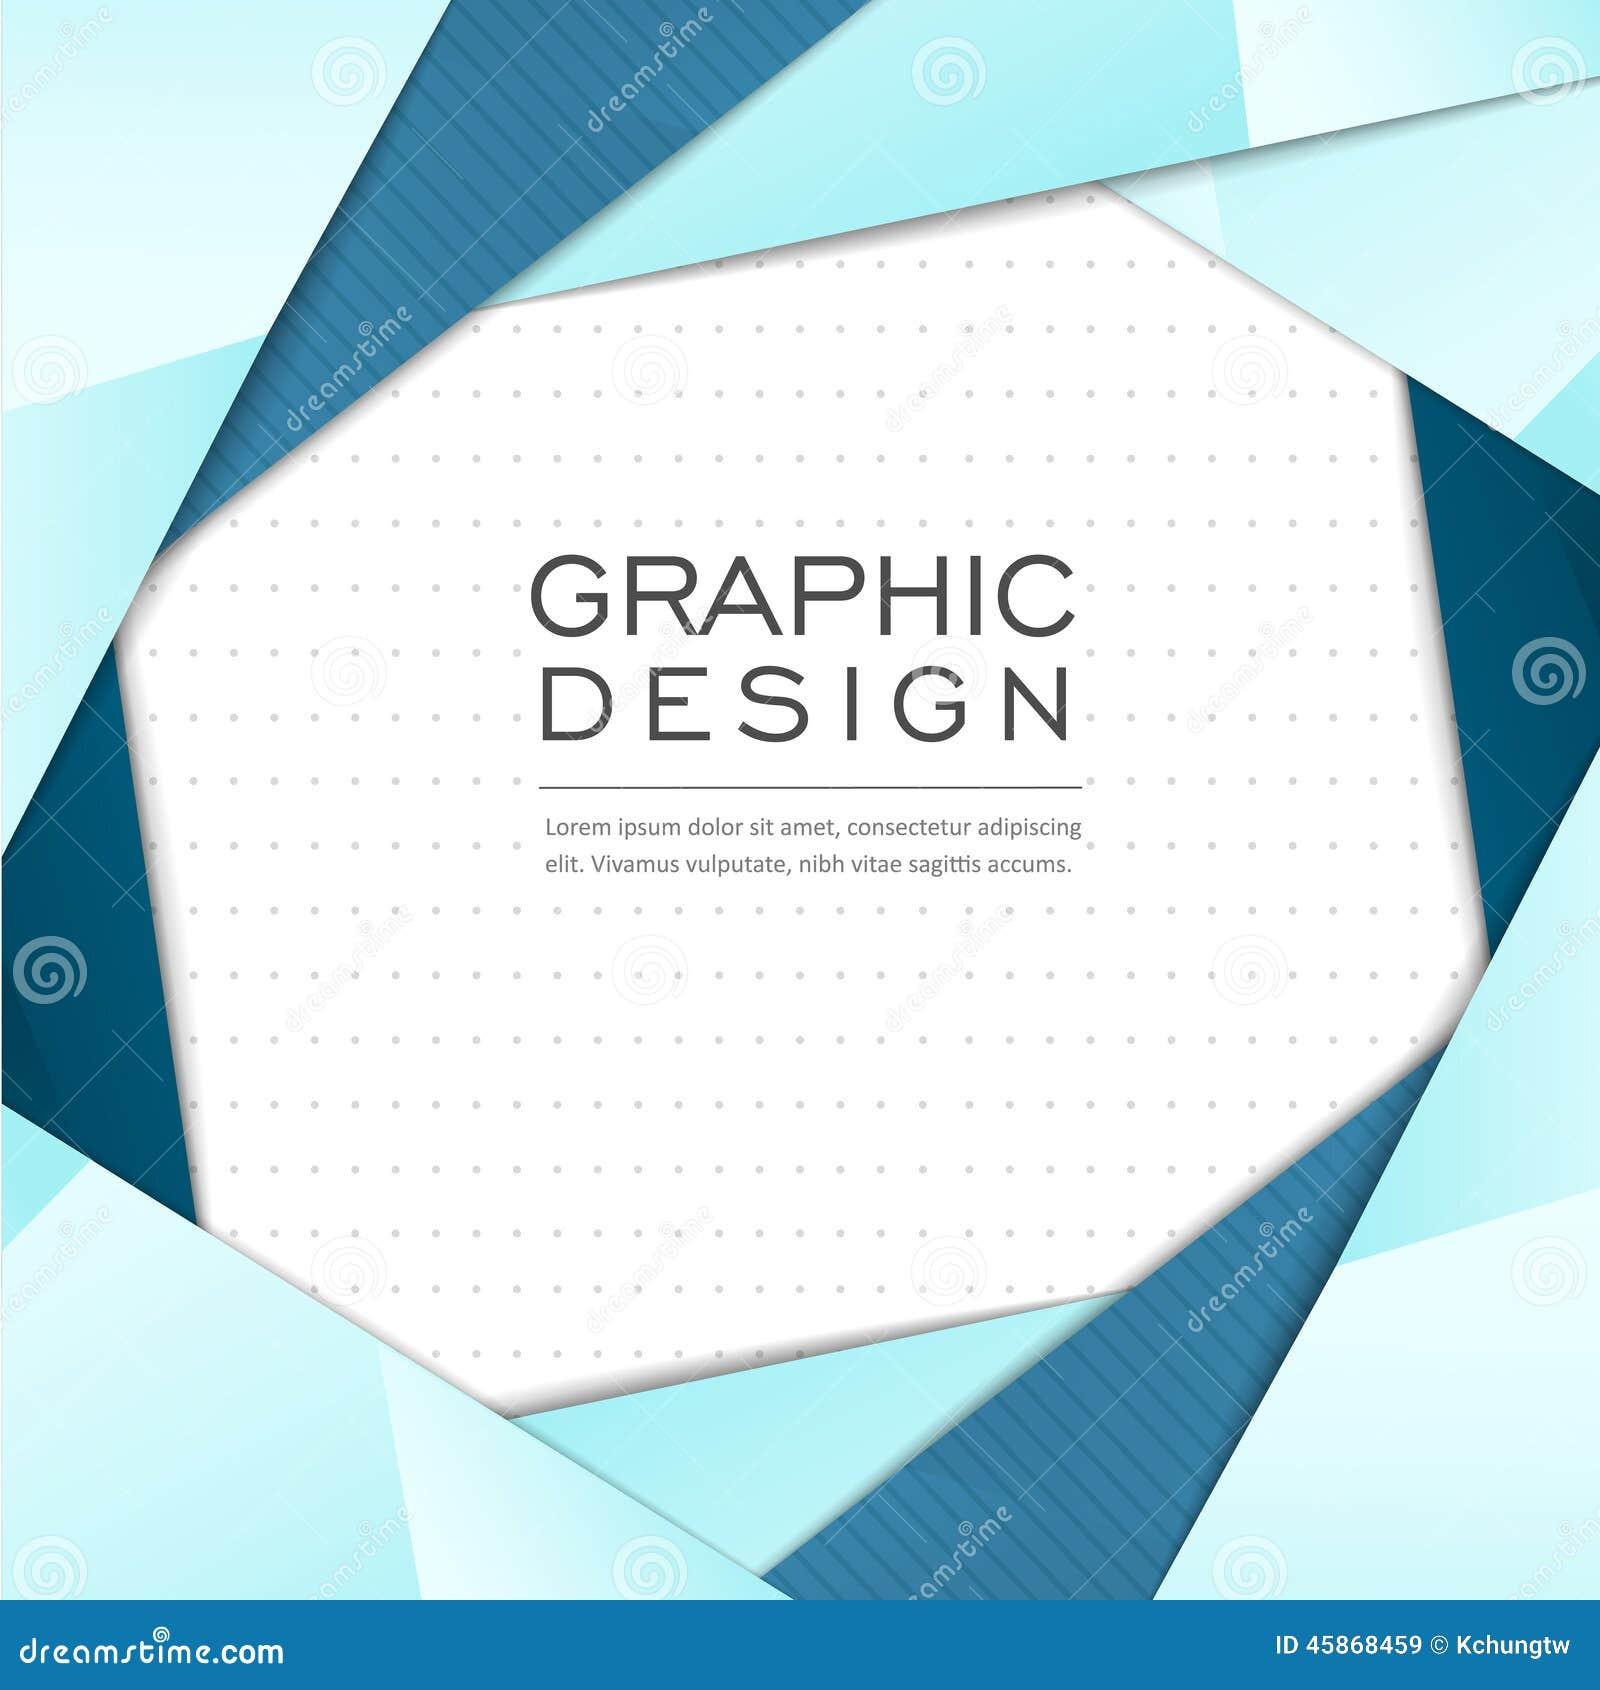 modern origami style design for poster template stock vector illustration 45868459. Black Bedroom Furniture Sets. Home Design Ideas